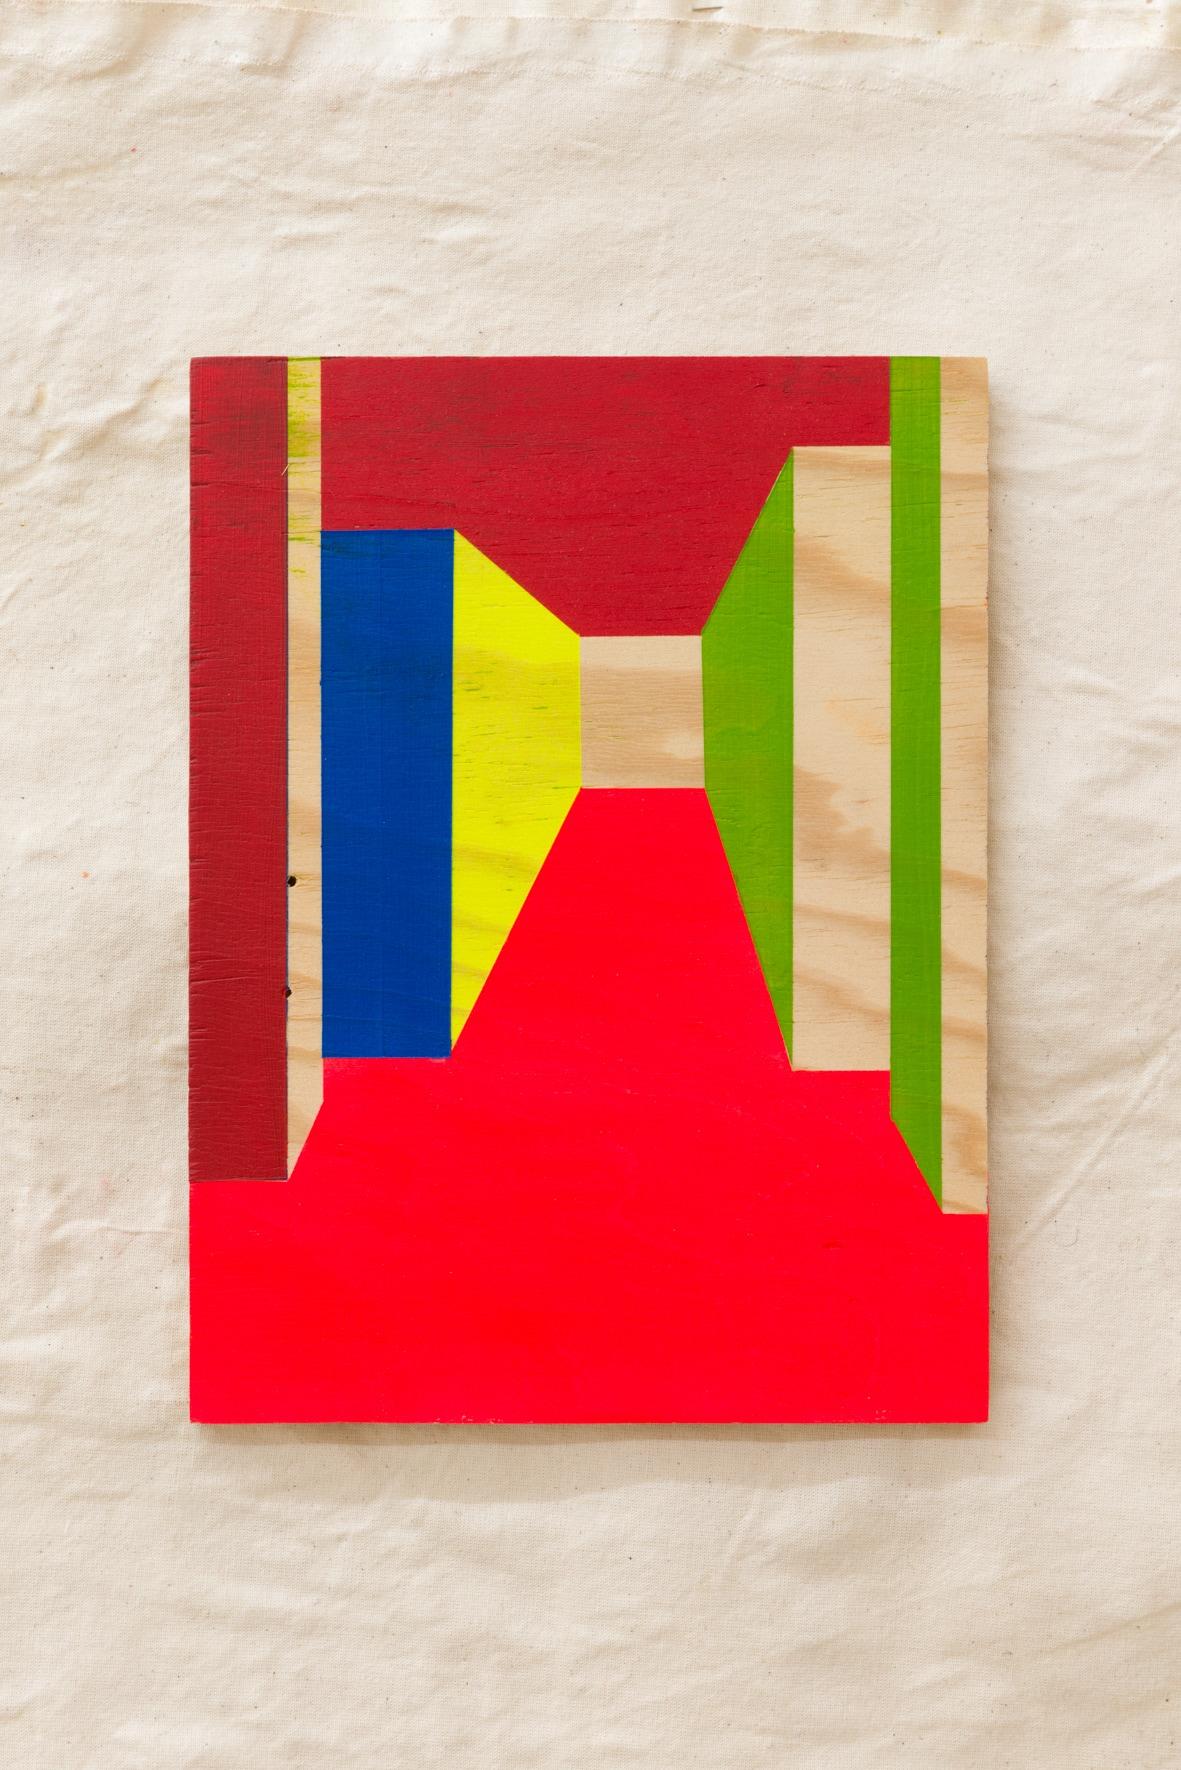 Charlie Jeffery, Corner Painting 2, 2016 Acrylic paint on wood